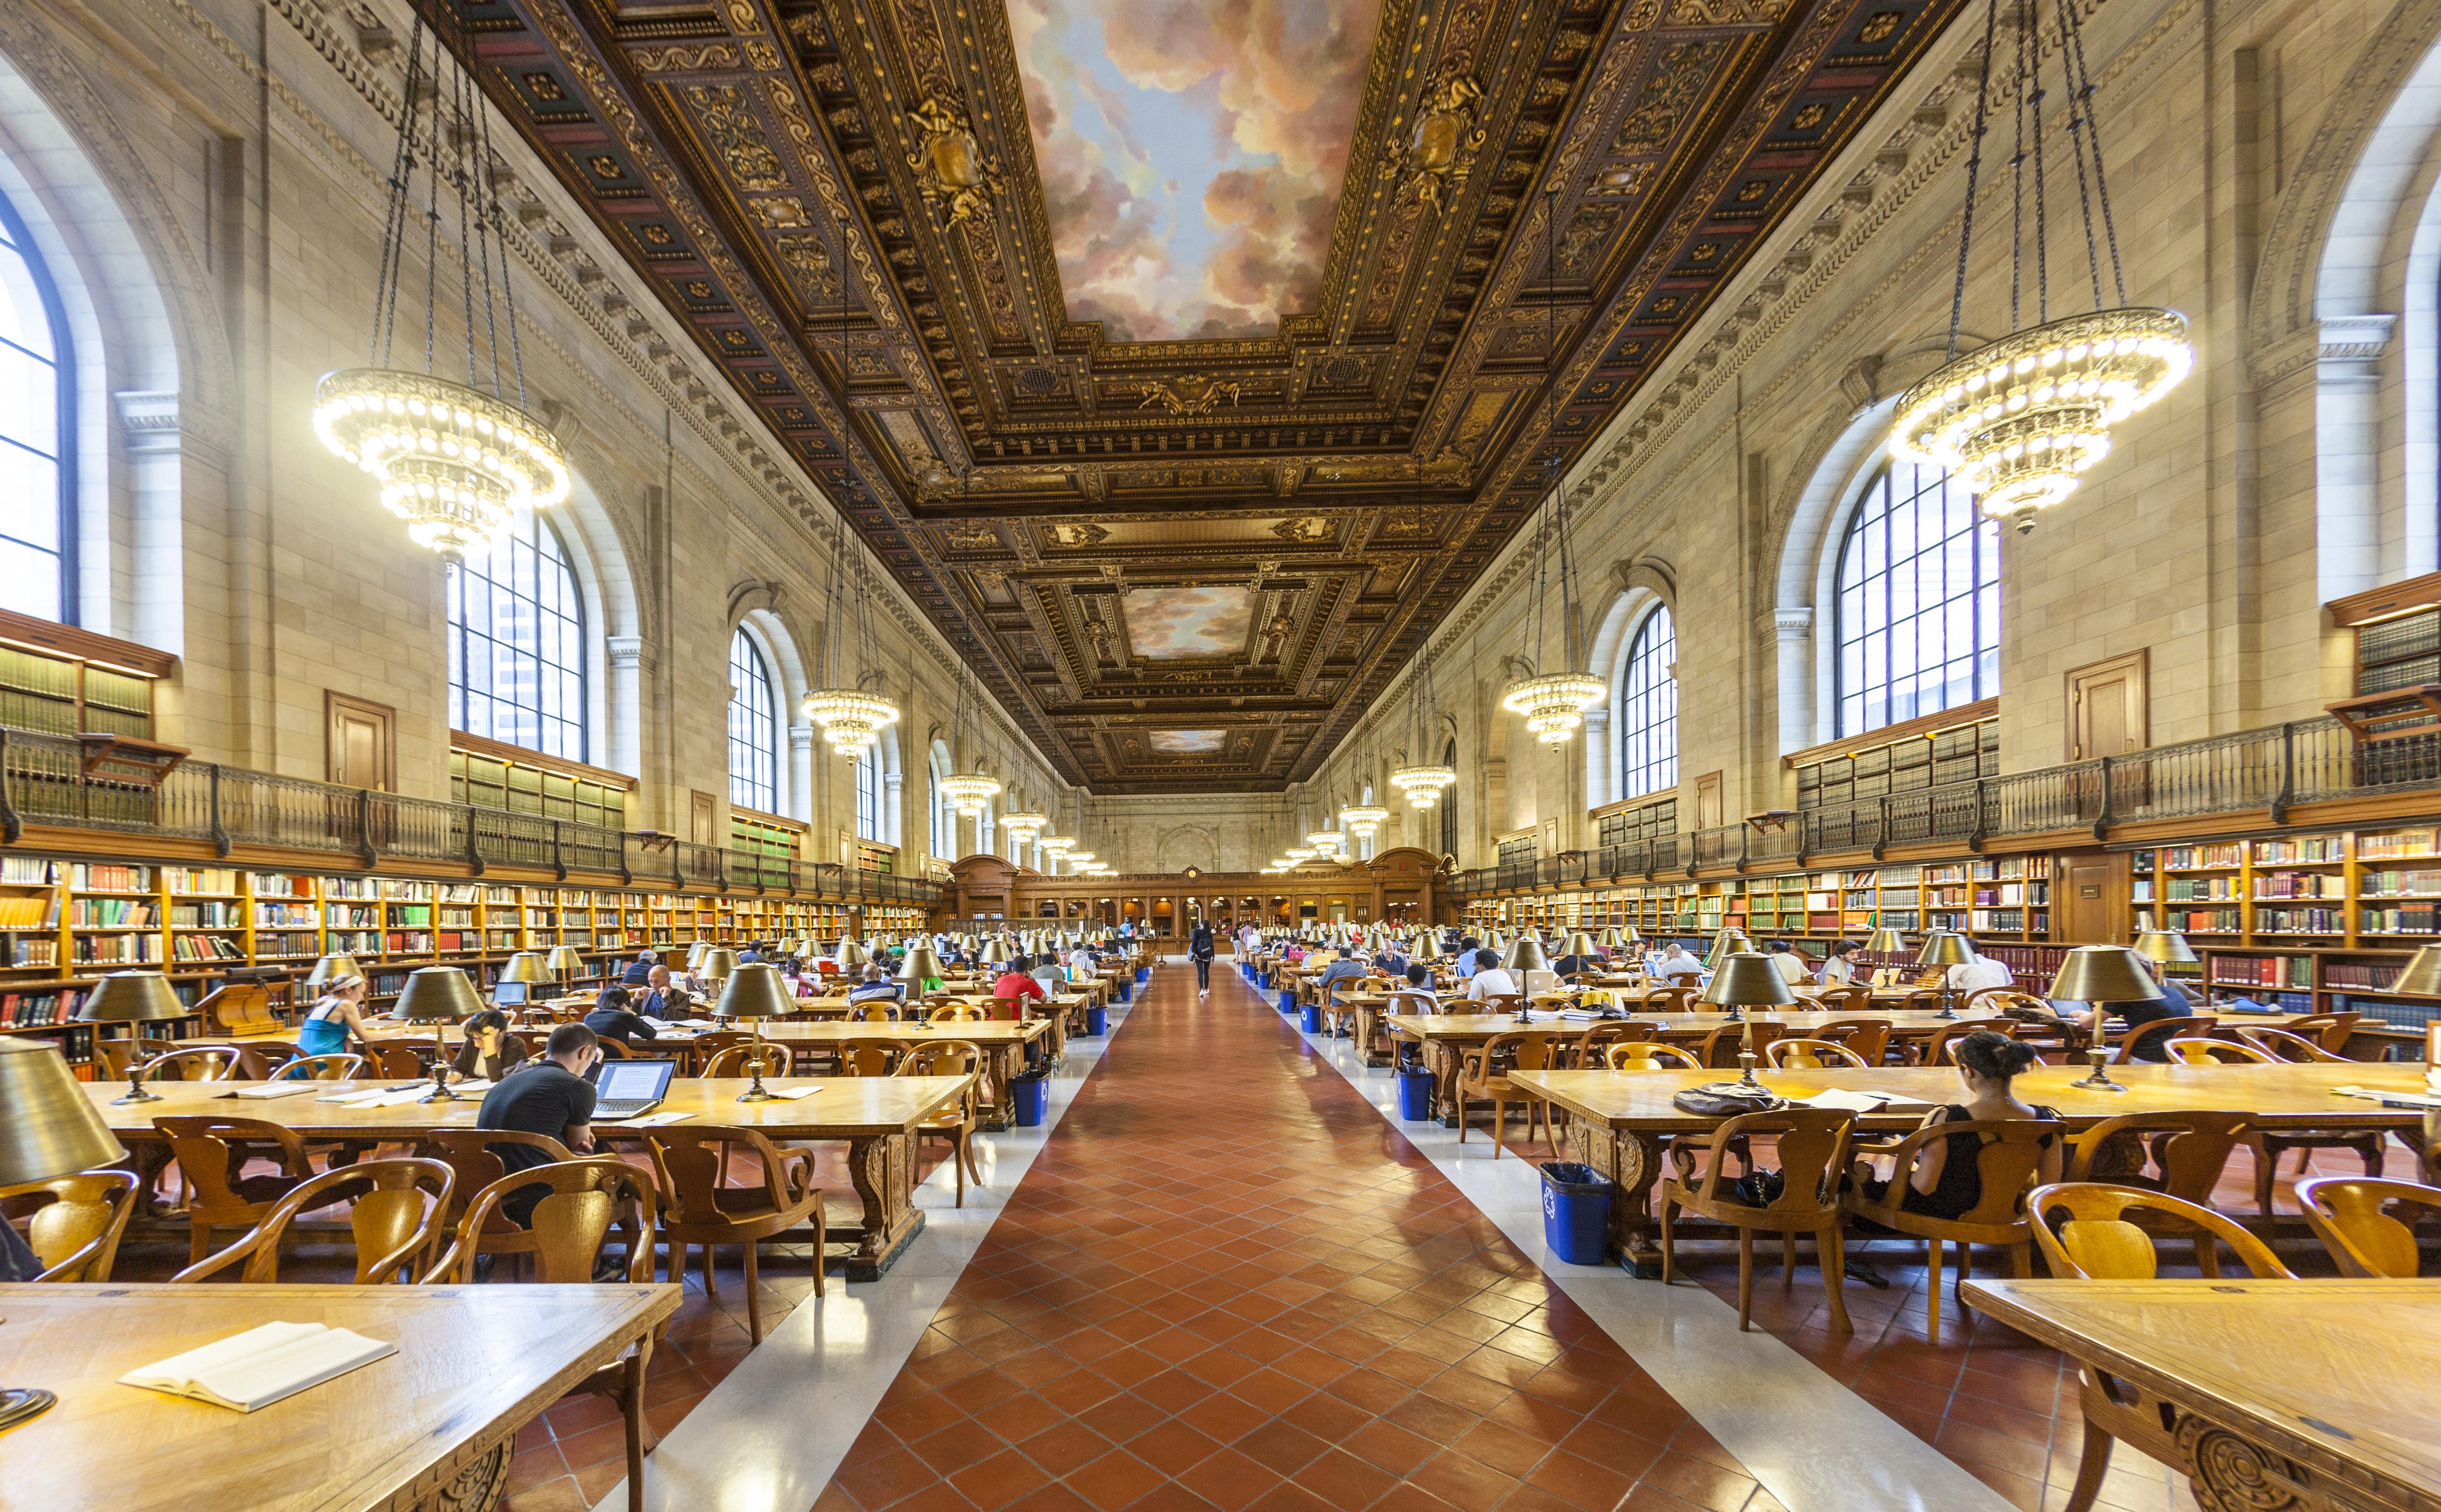 New York Public Library. Travelview, shutterstock